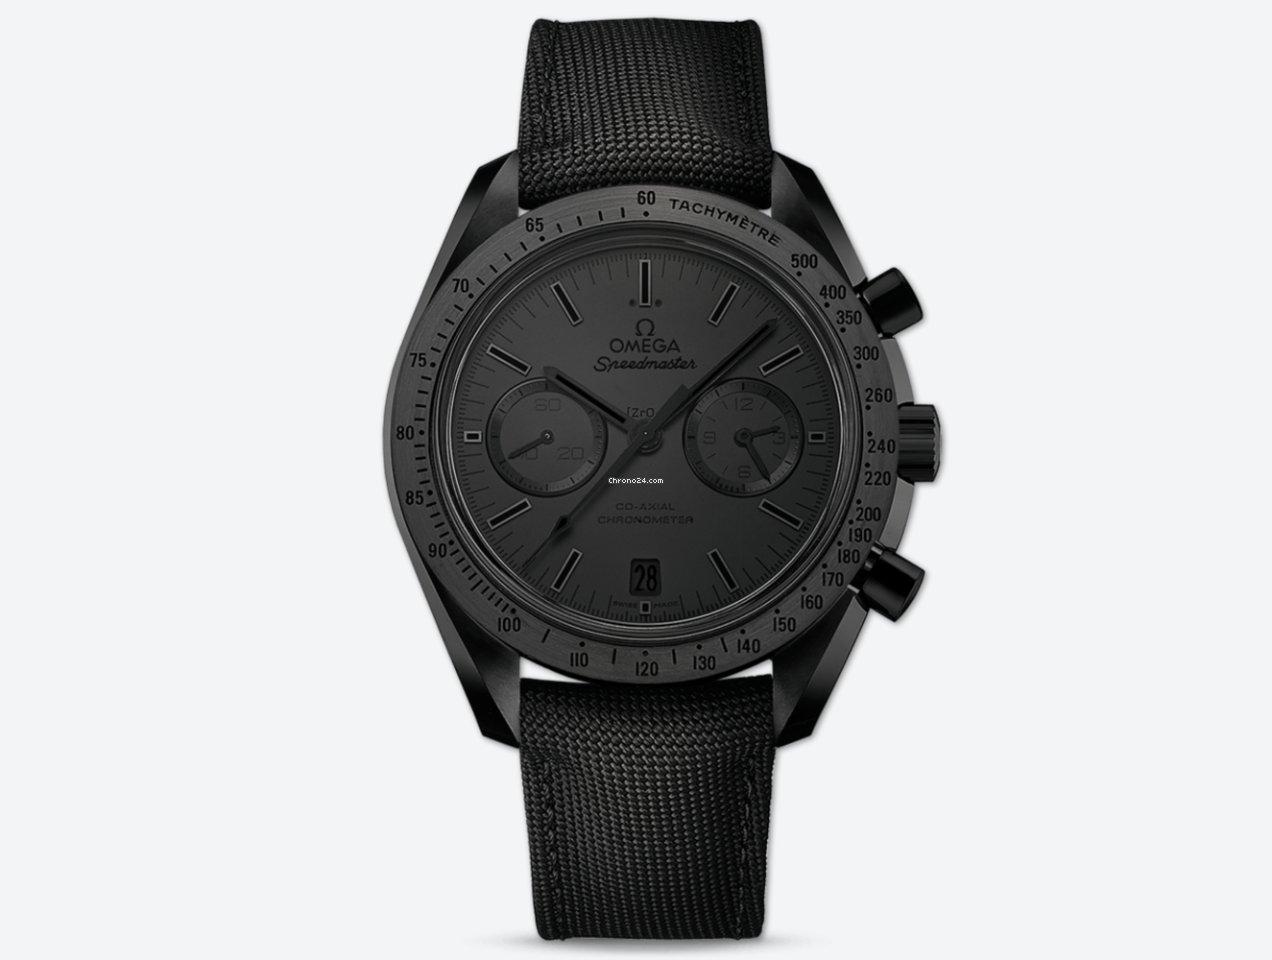 Omega (オメガ) スピードマスター プロフェッショナル 311.92.44.51.01.005 Black Black 2020 新品